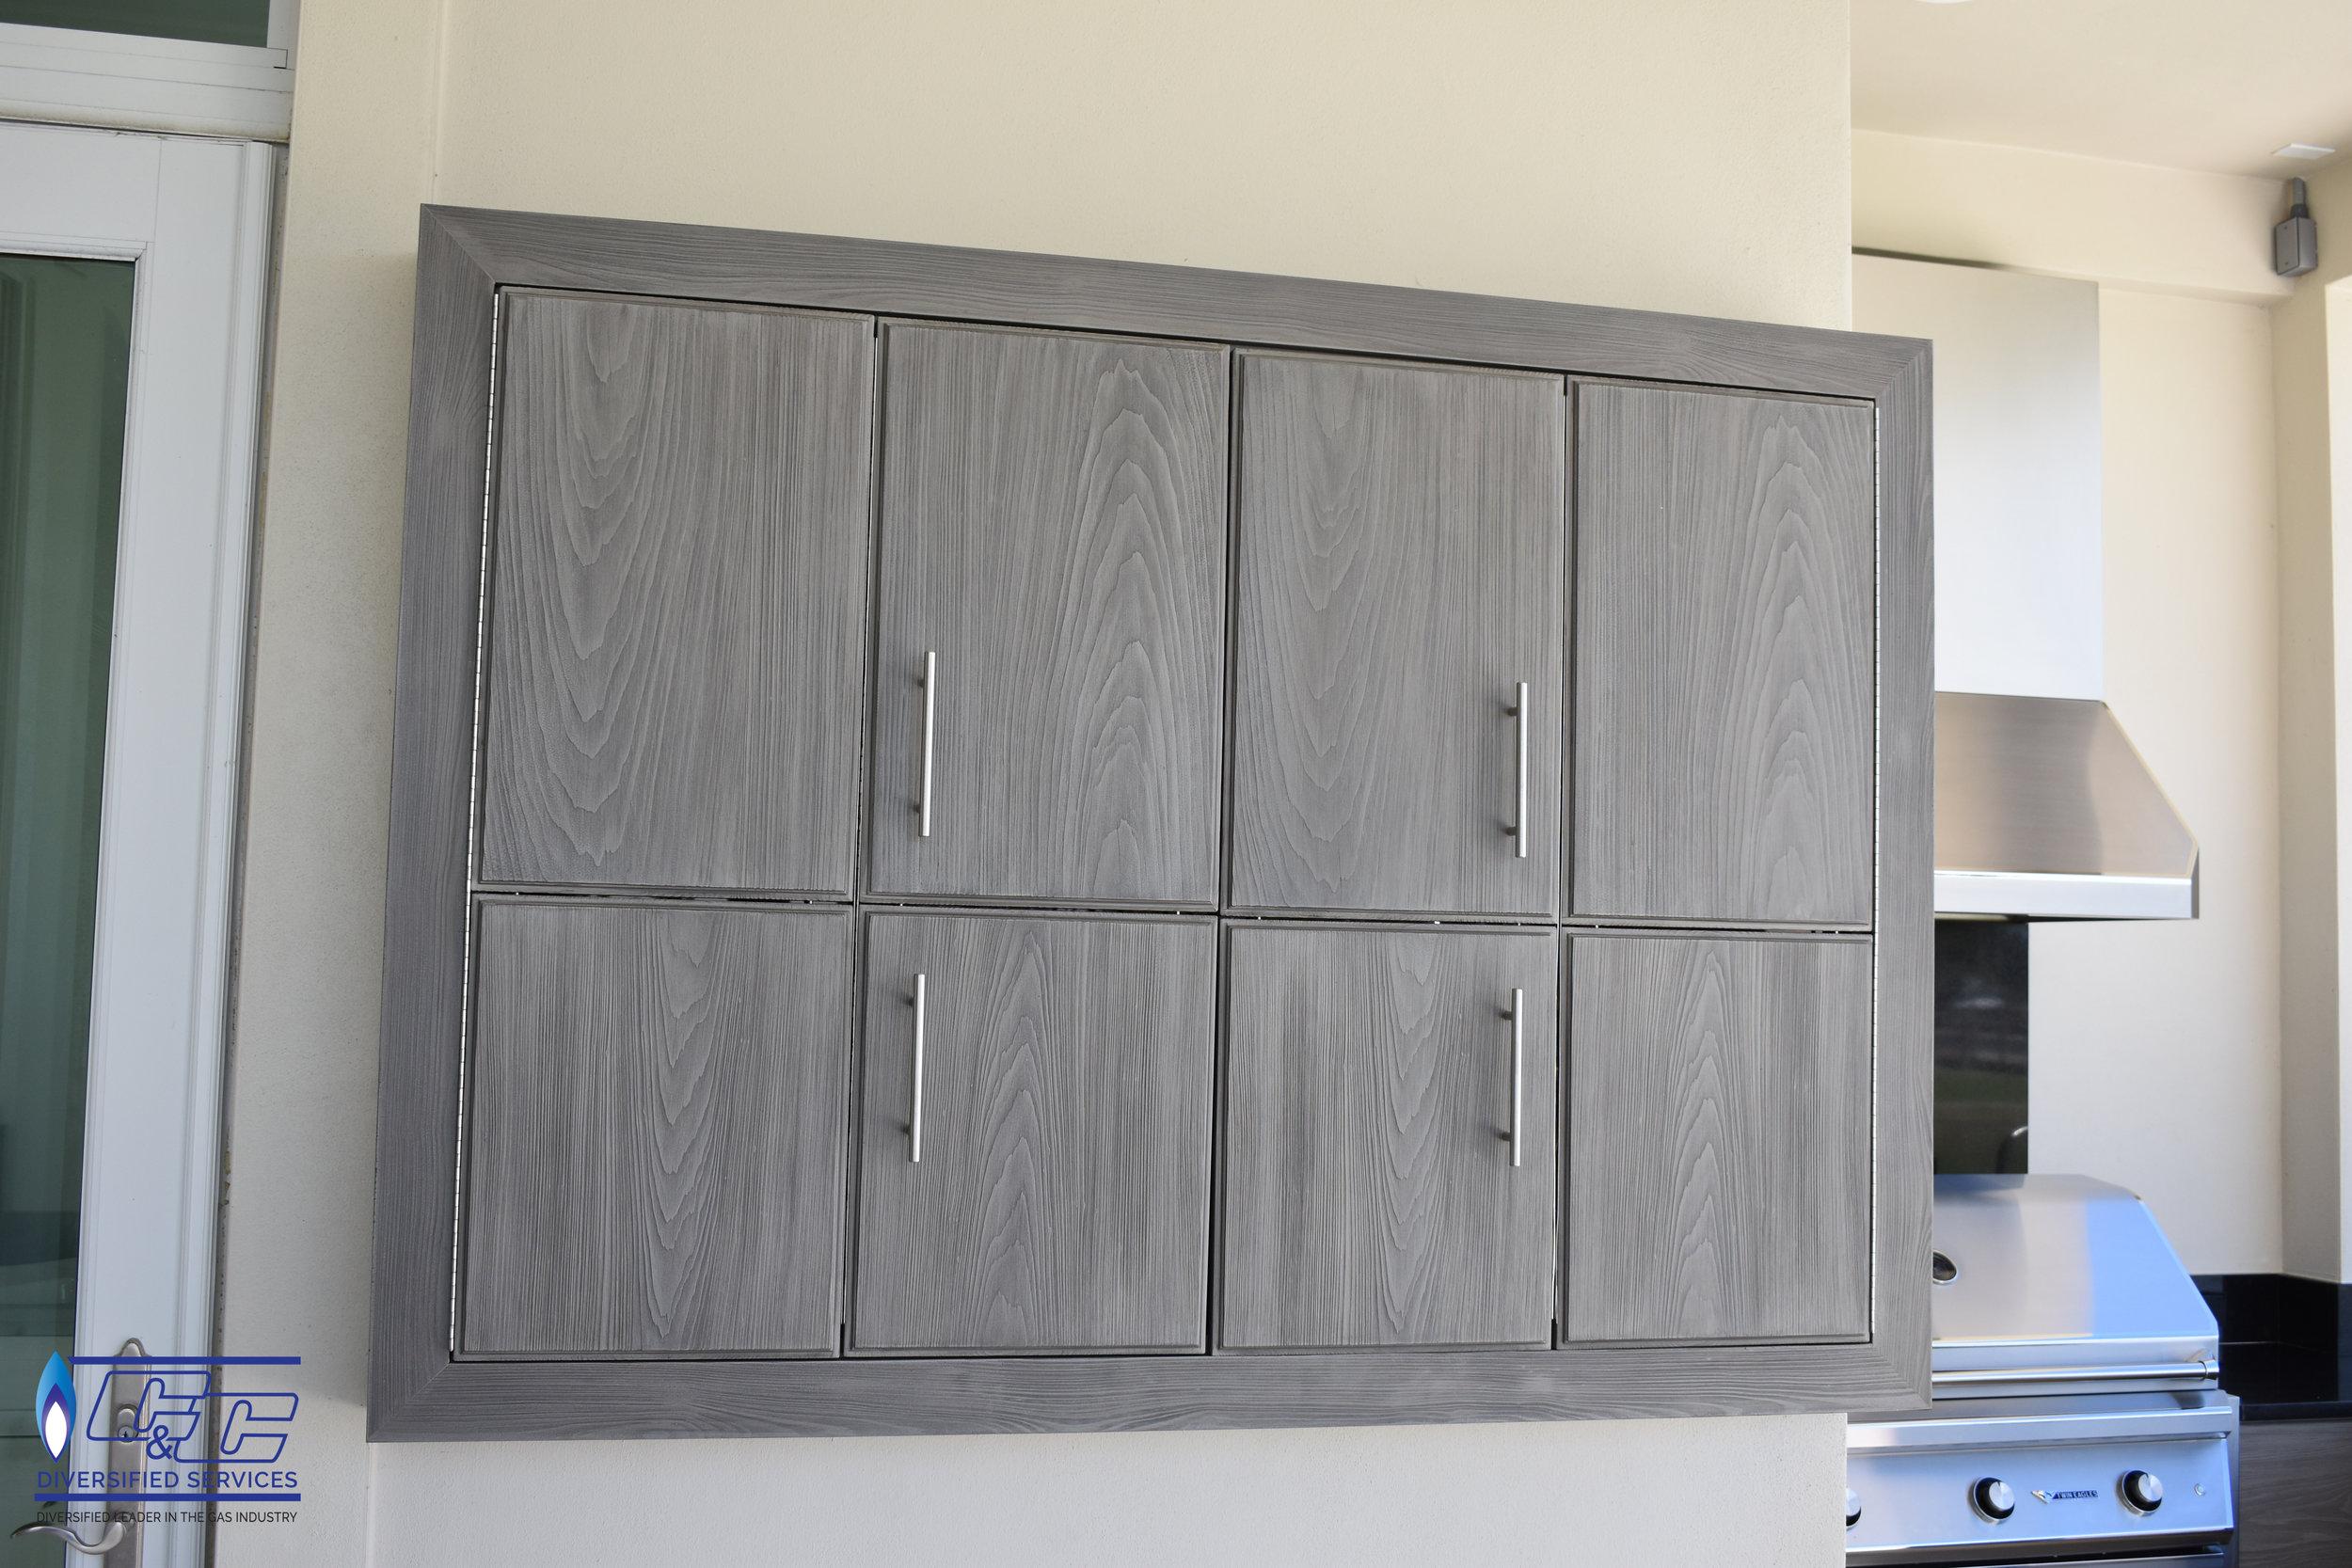 NatureKast Weatherproof Cabinetry in Fossil Gray Bi-fold TV Cabinet